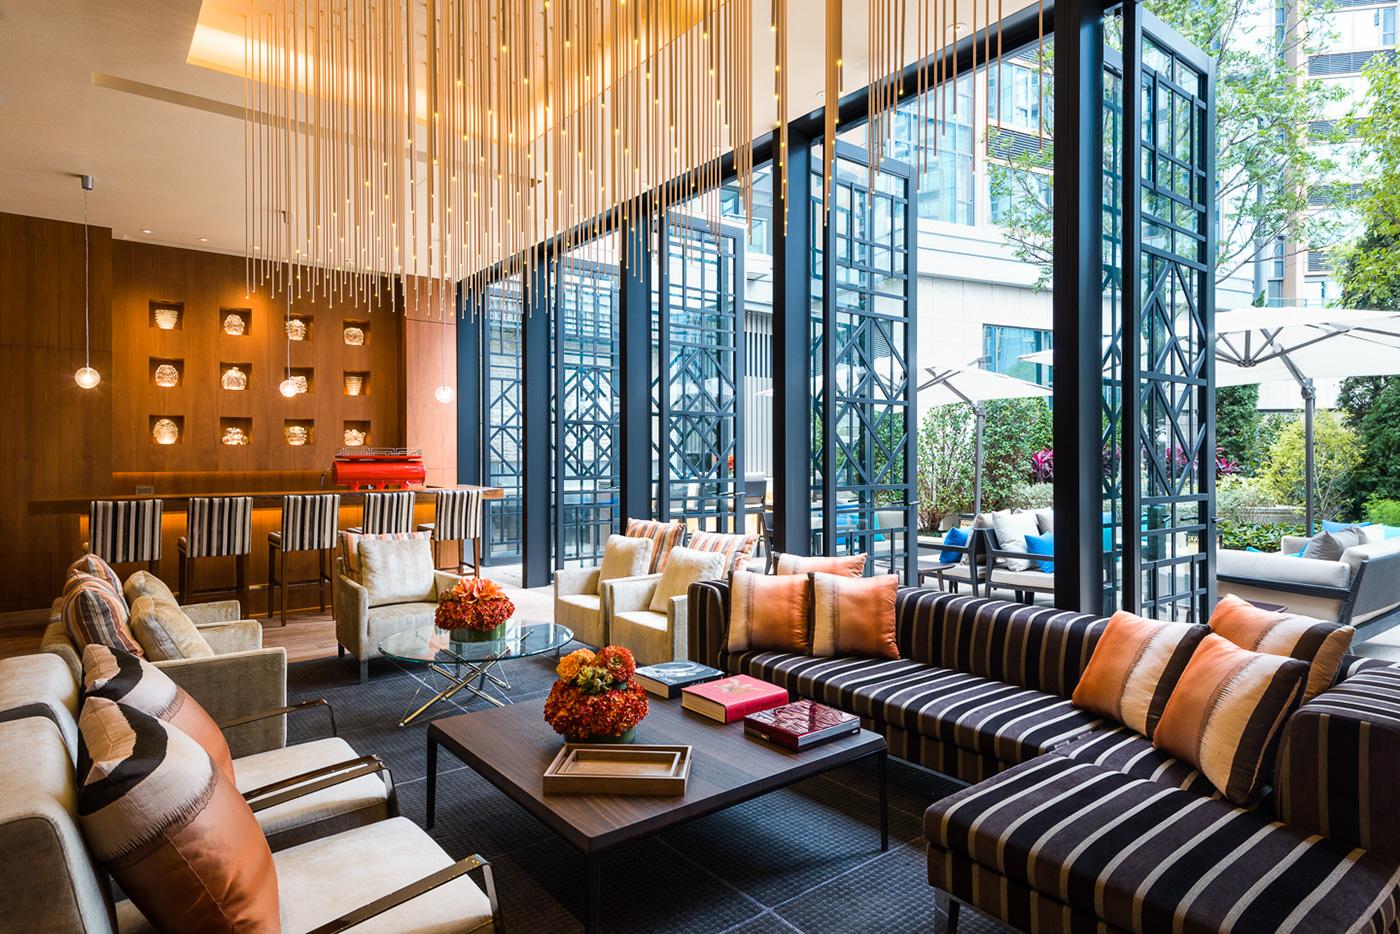 Residential clubhouse yuen long hong kong on behance for Residential clubhouse designs